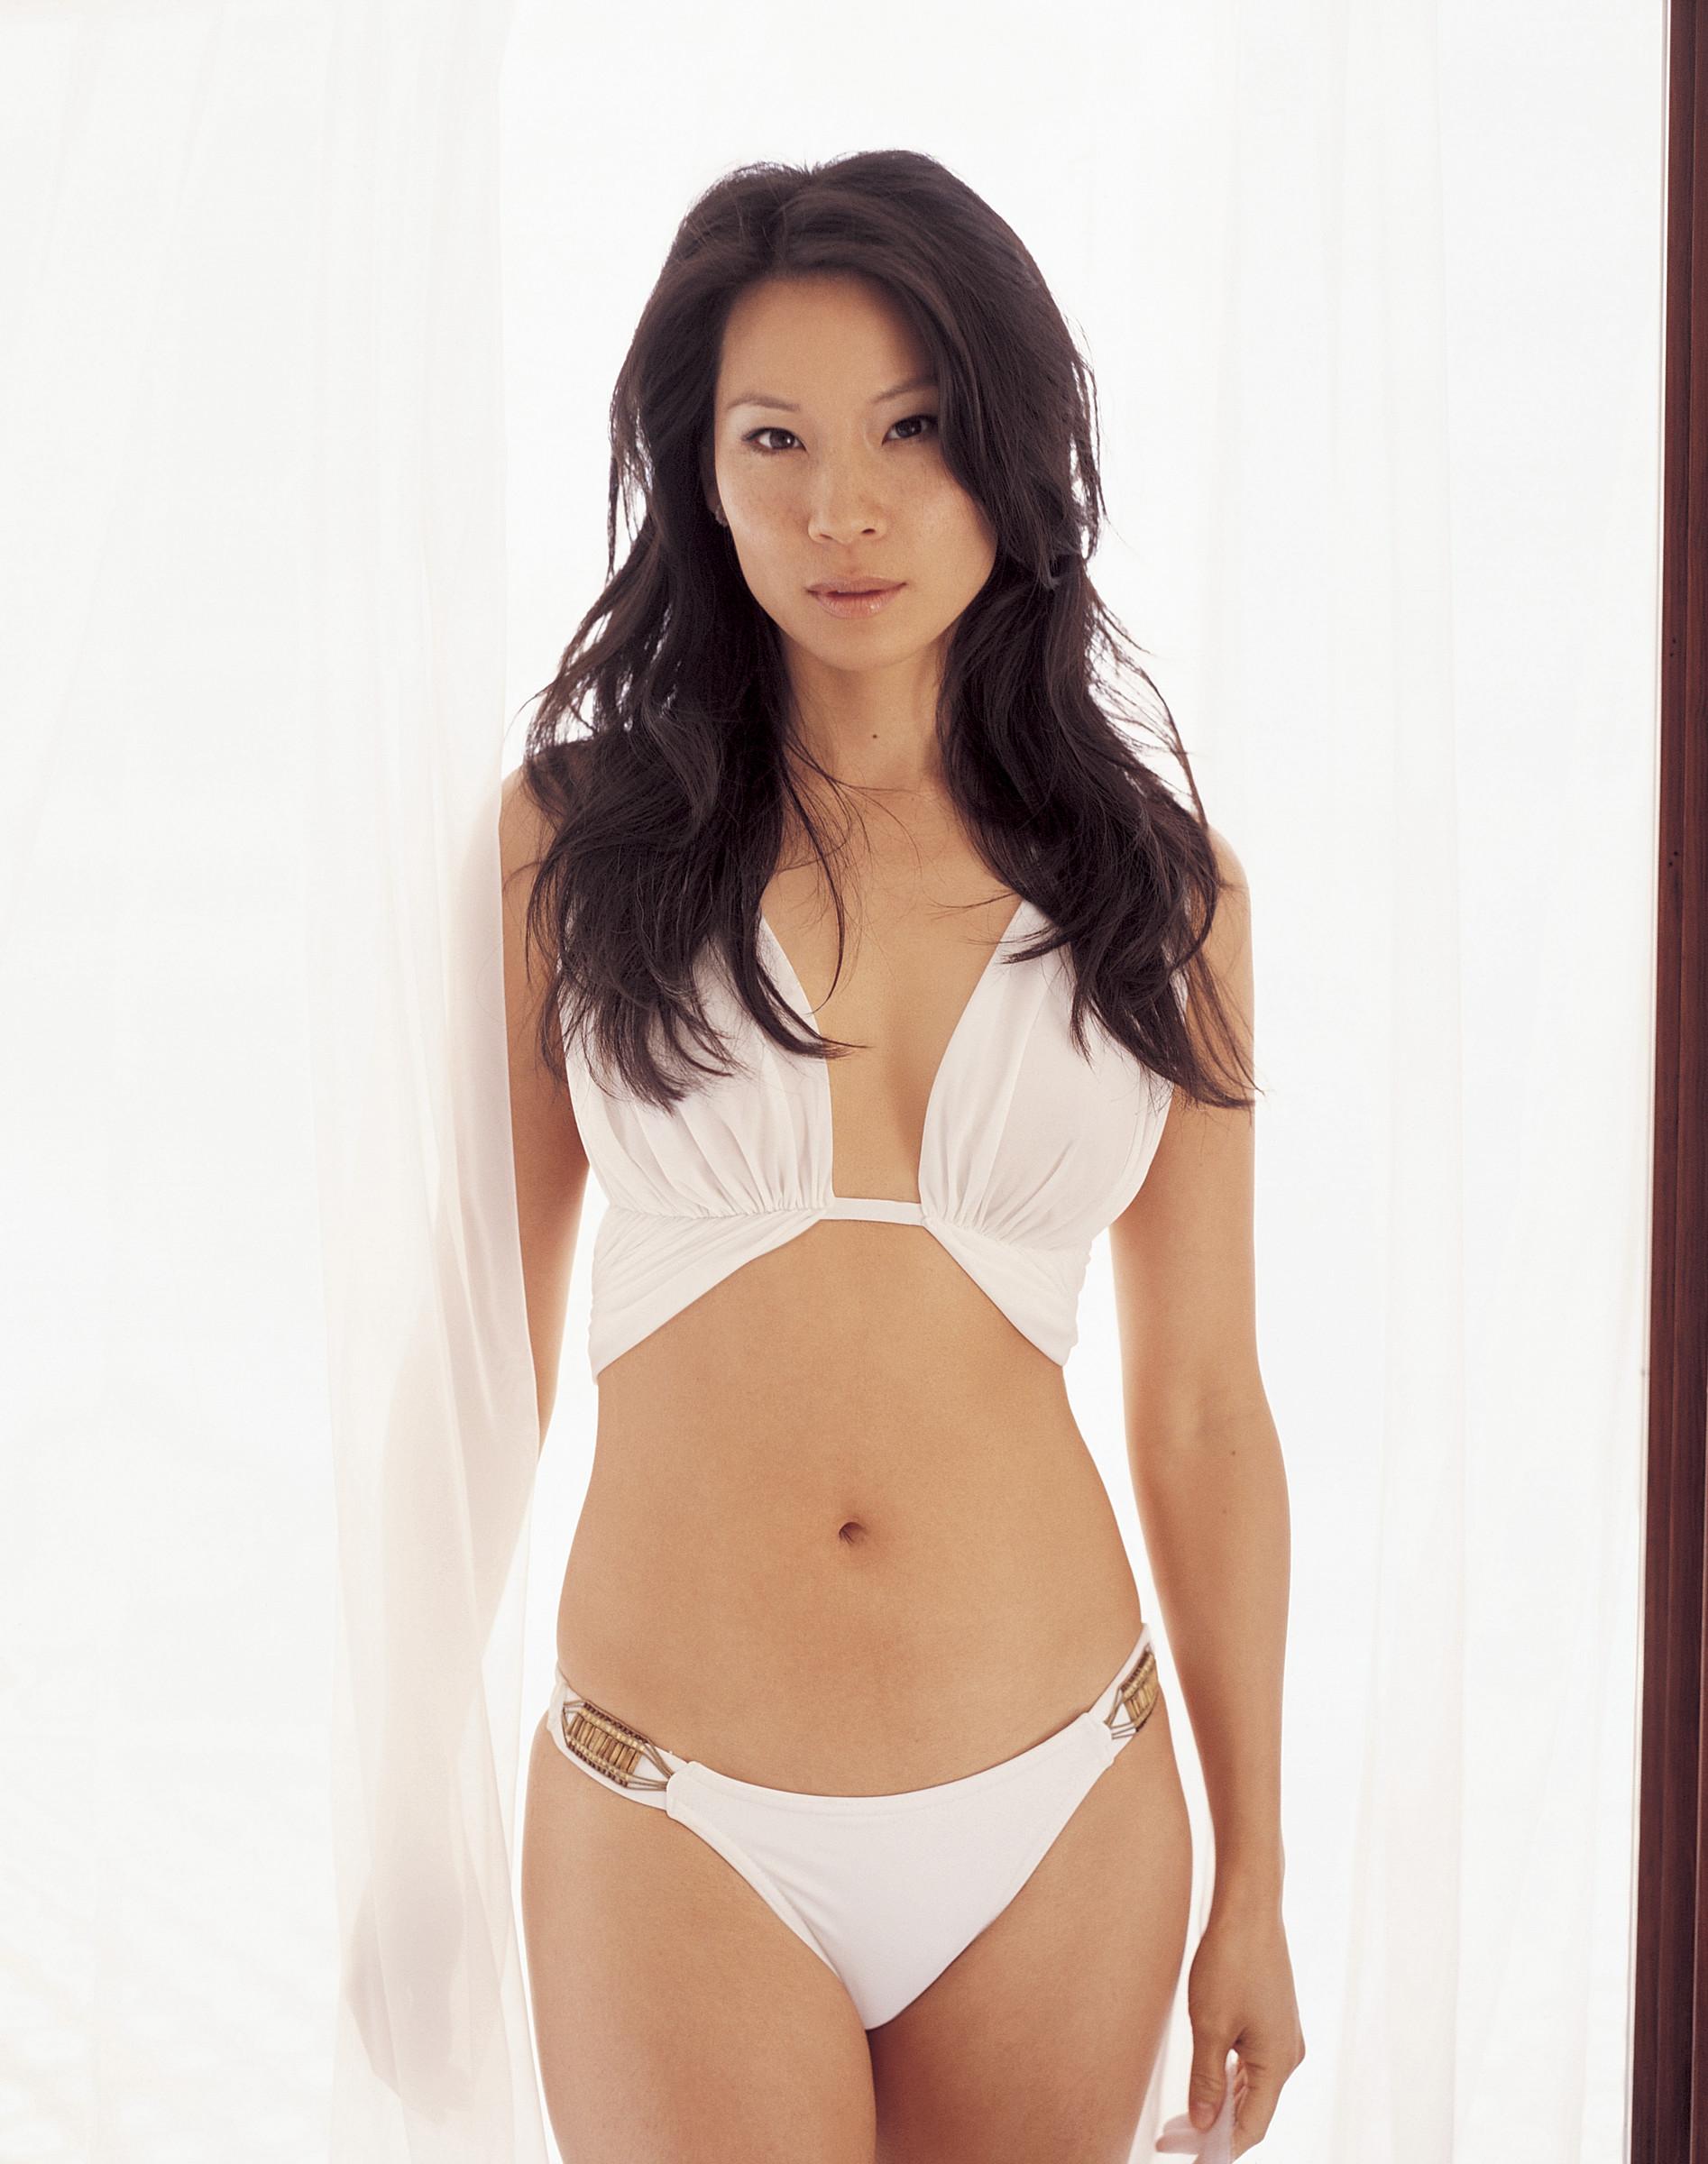 Tits Bikini Lucy Liu naked photo 2017